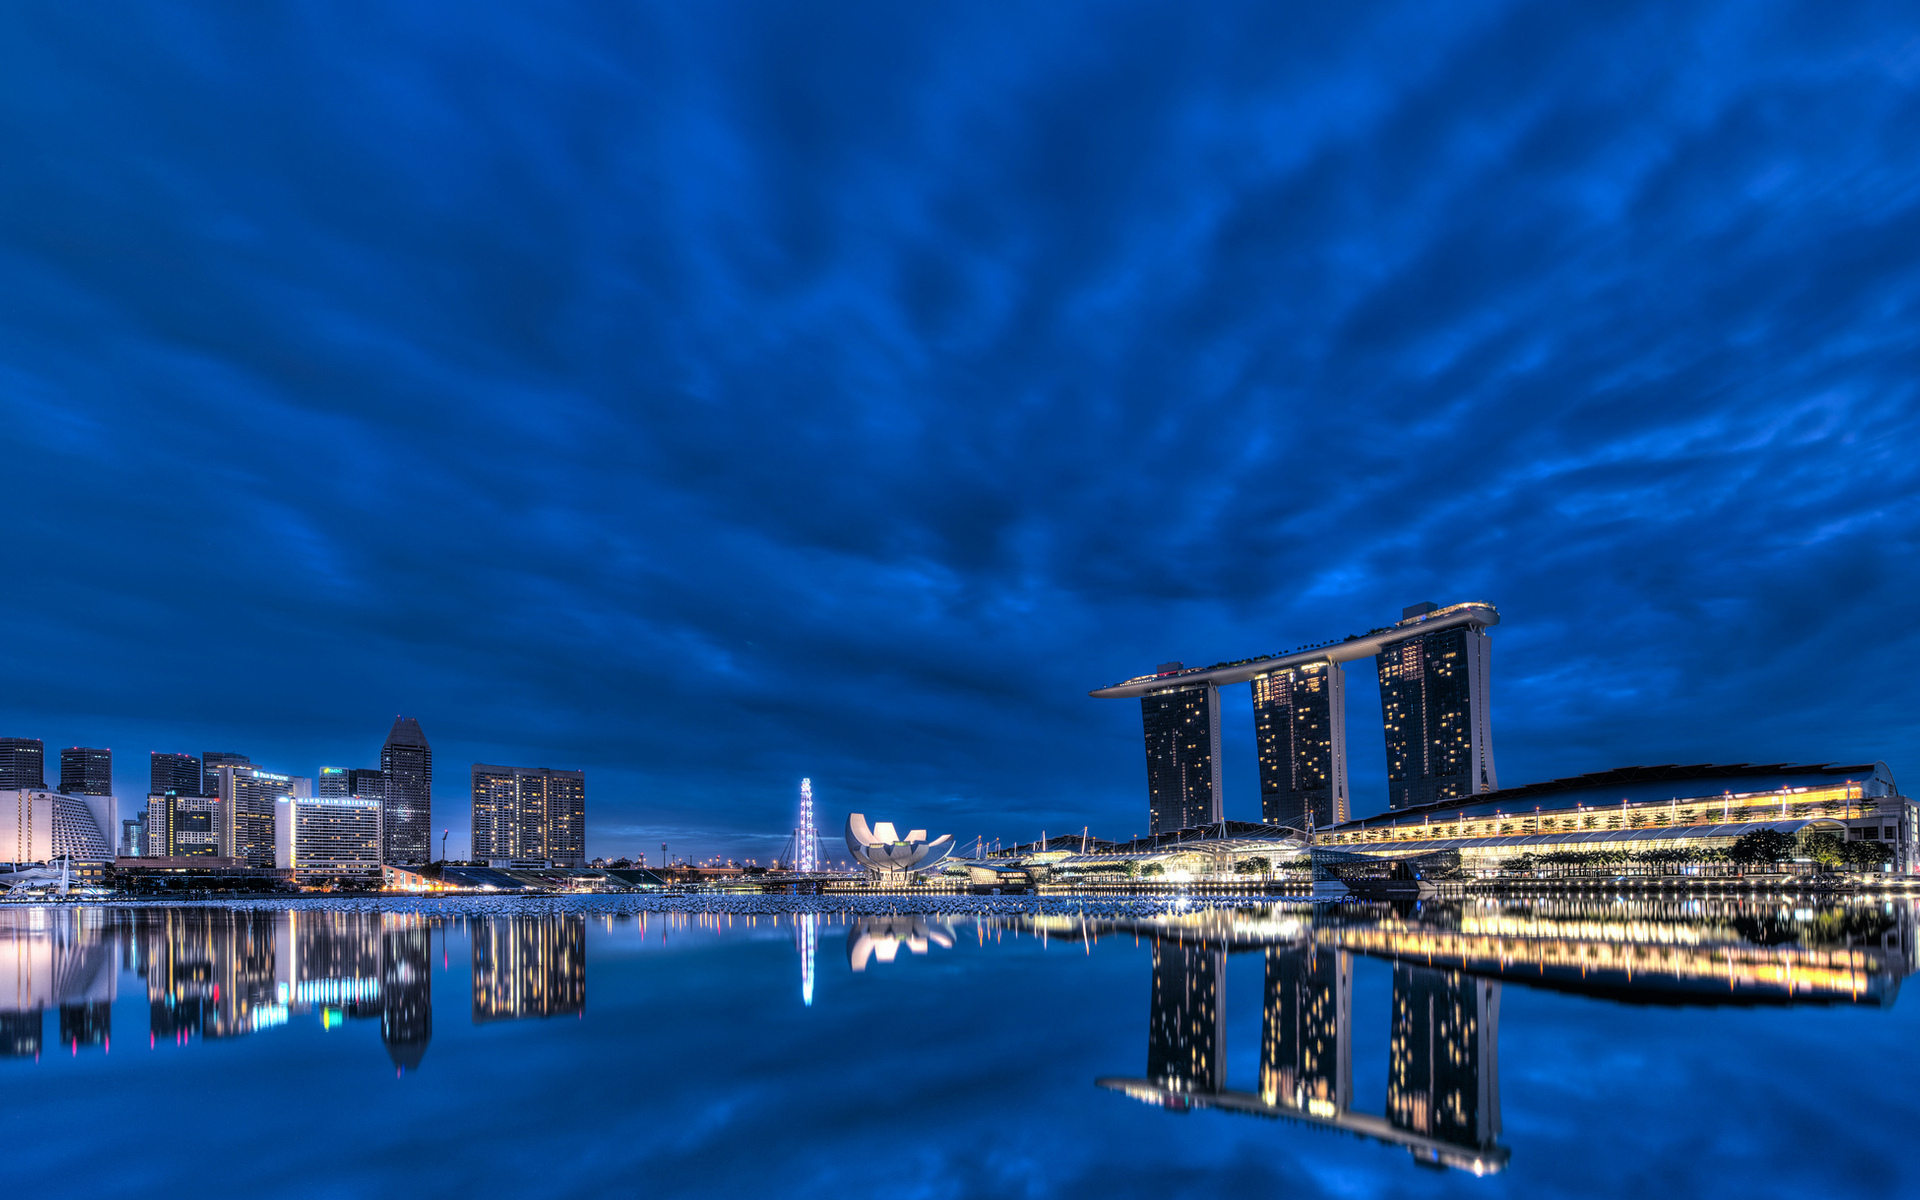 страны архитектура Сингапур ночь бесплатно